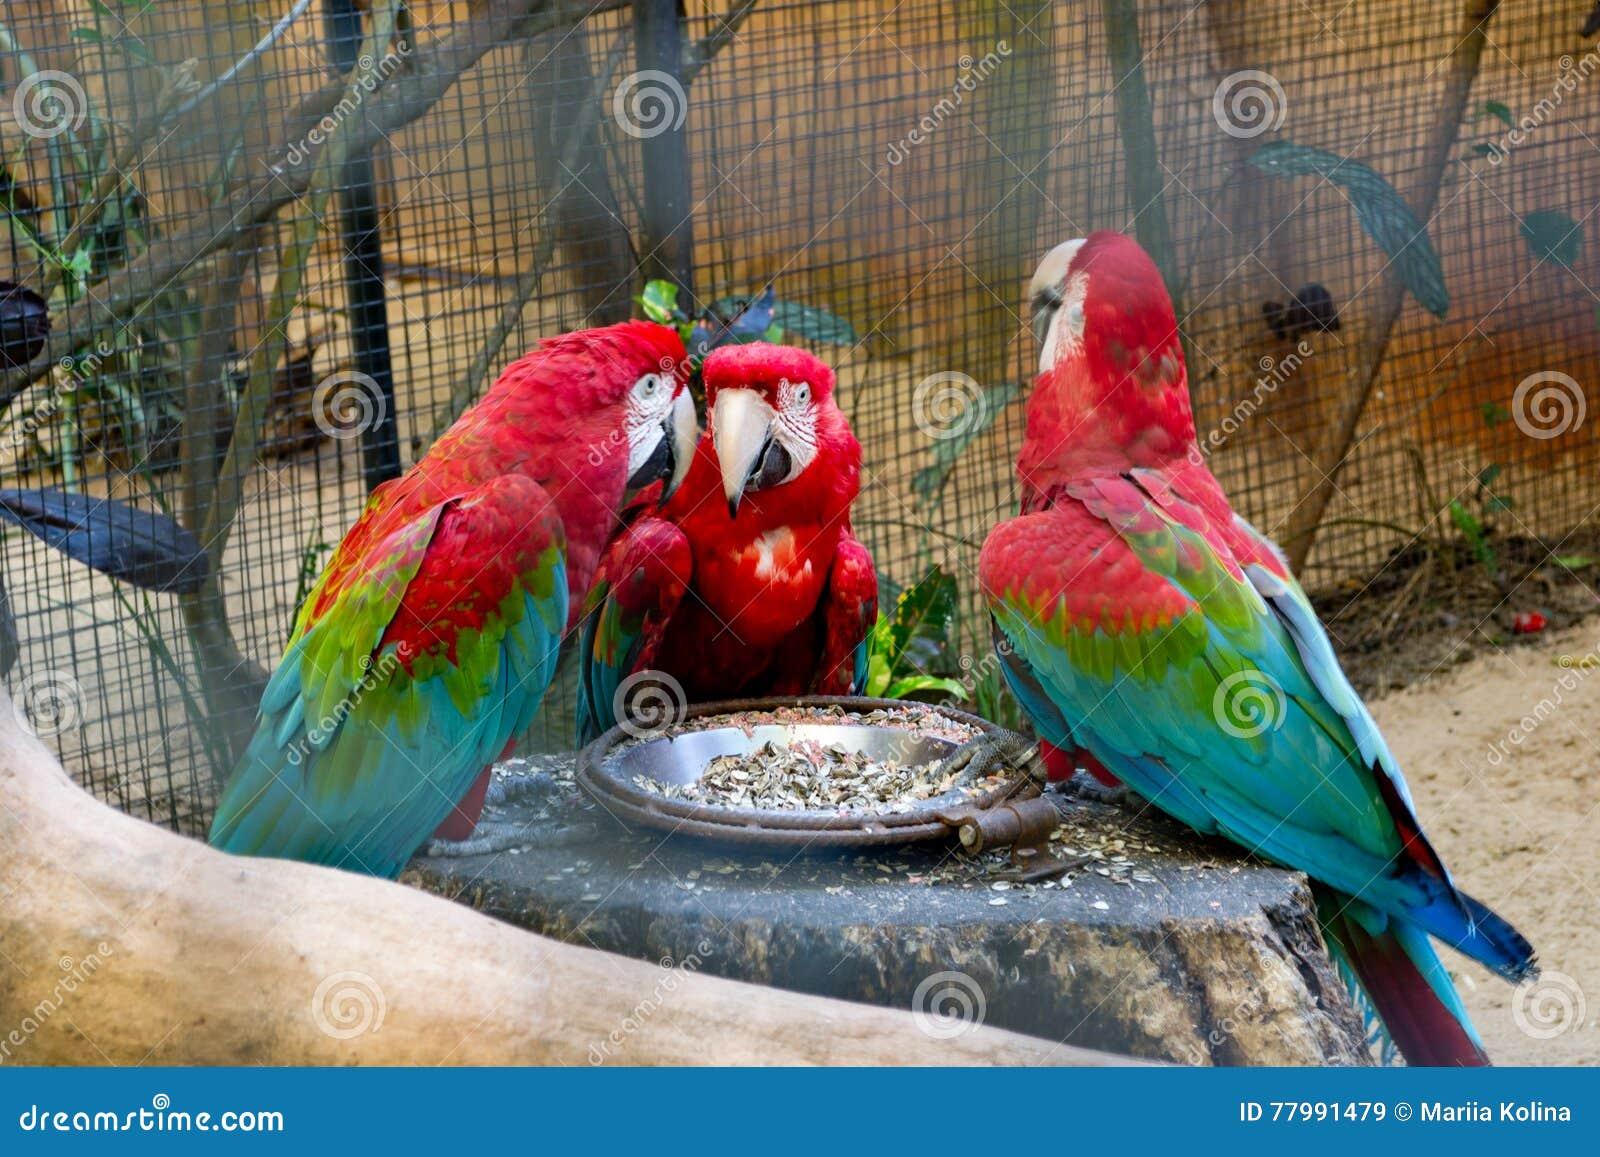 Big red speaking ara parrots in zoo